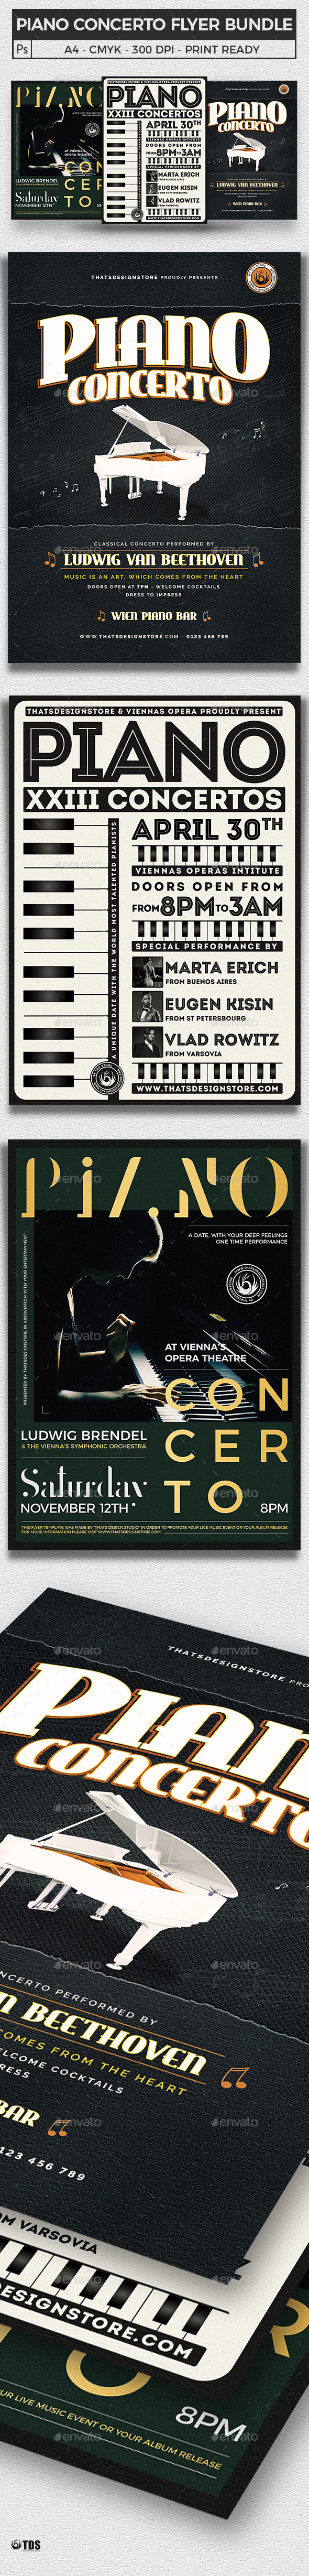 Piano Concerto Flyer Bundle - Concerts Events